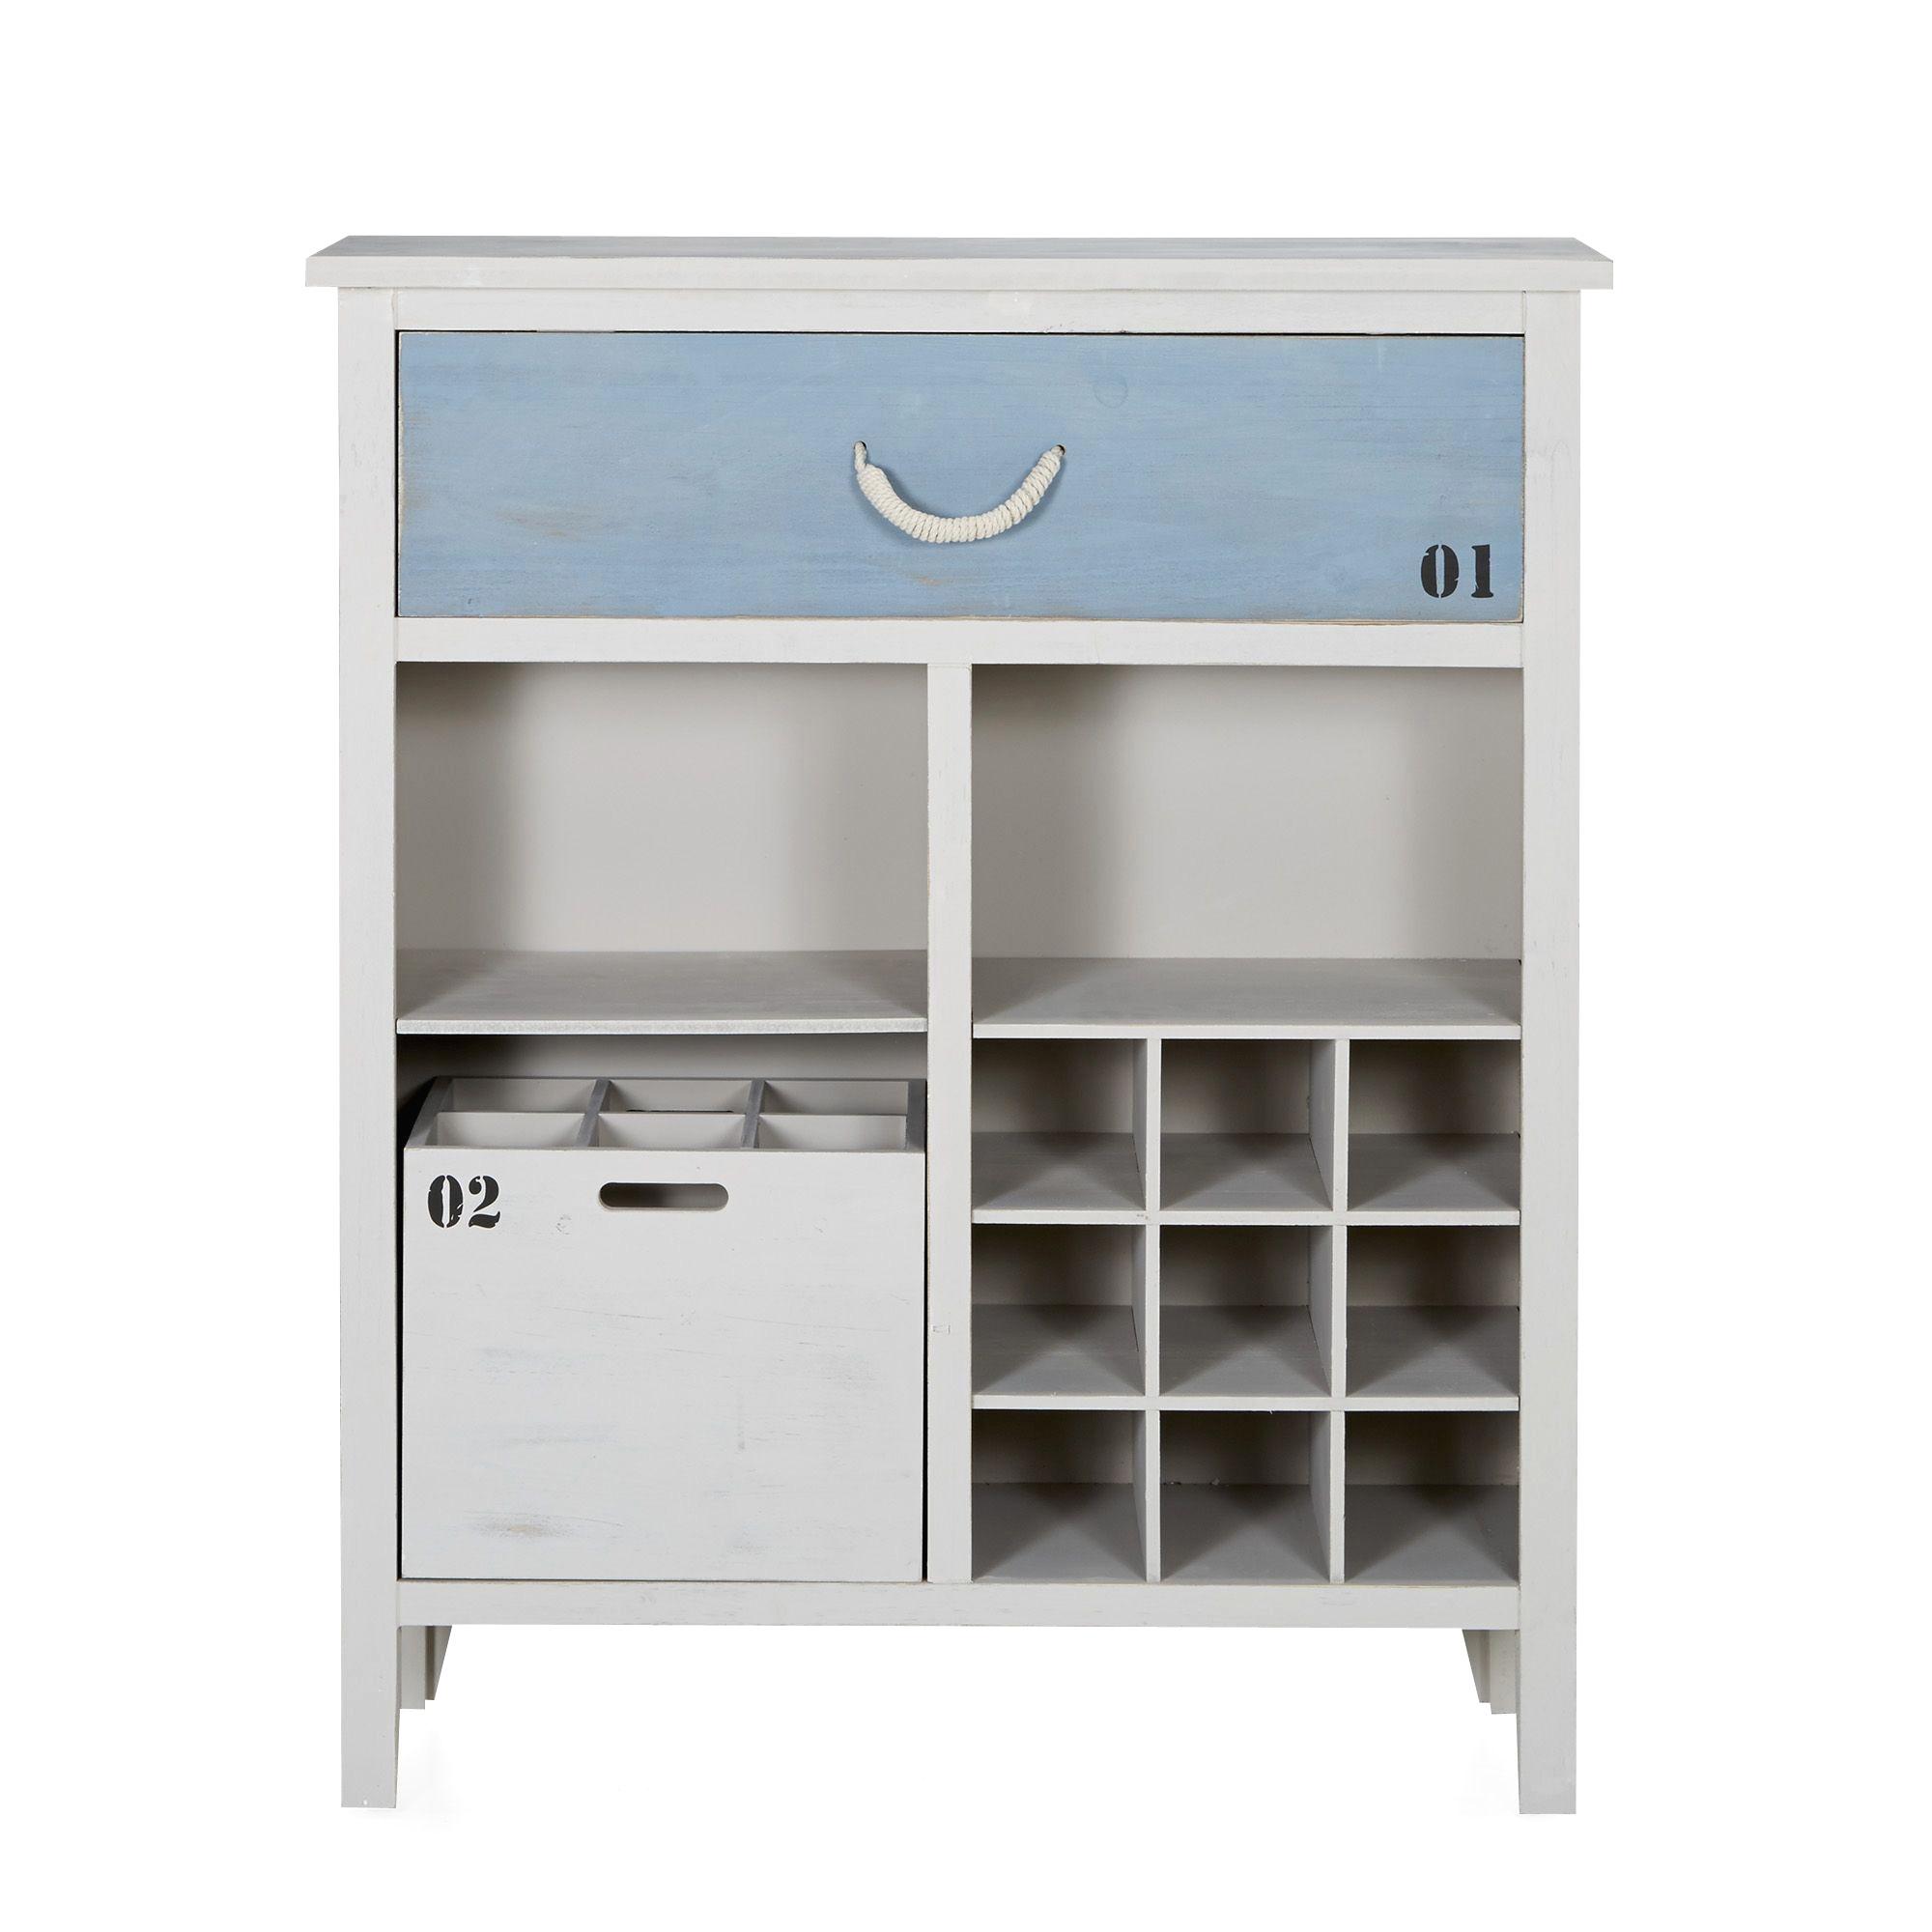 cuisine pas cher alinea. Black Bedroom Furniture Sets. Home Design Ideas